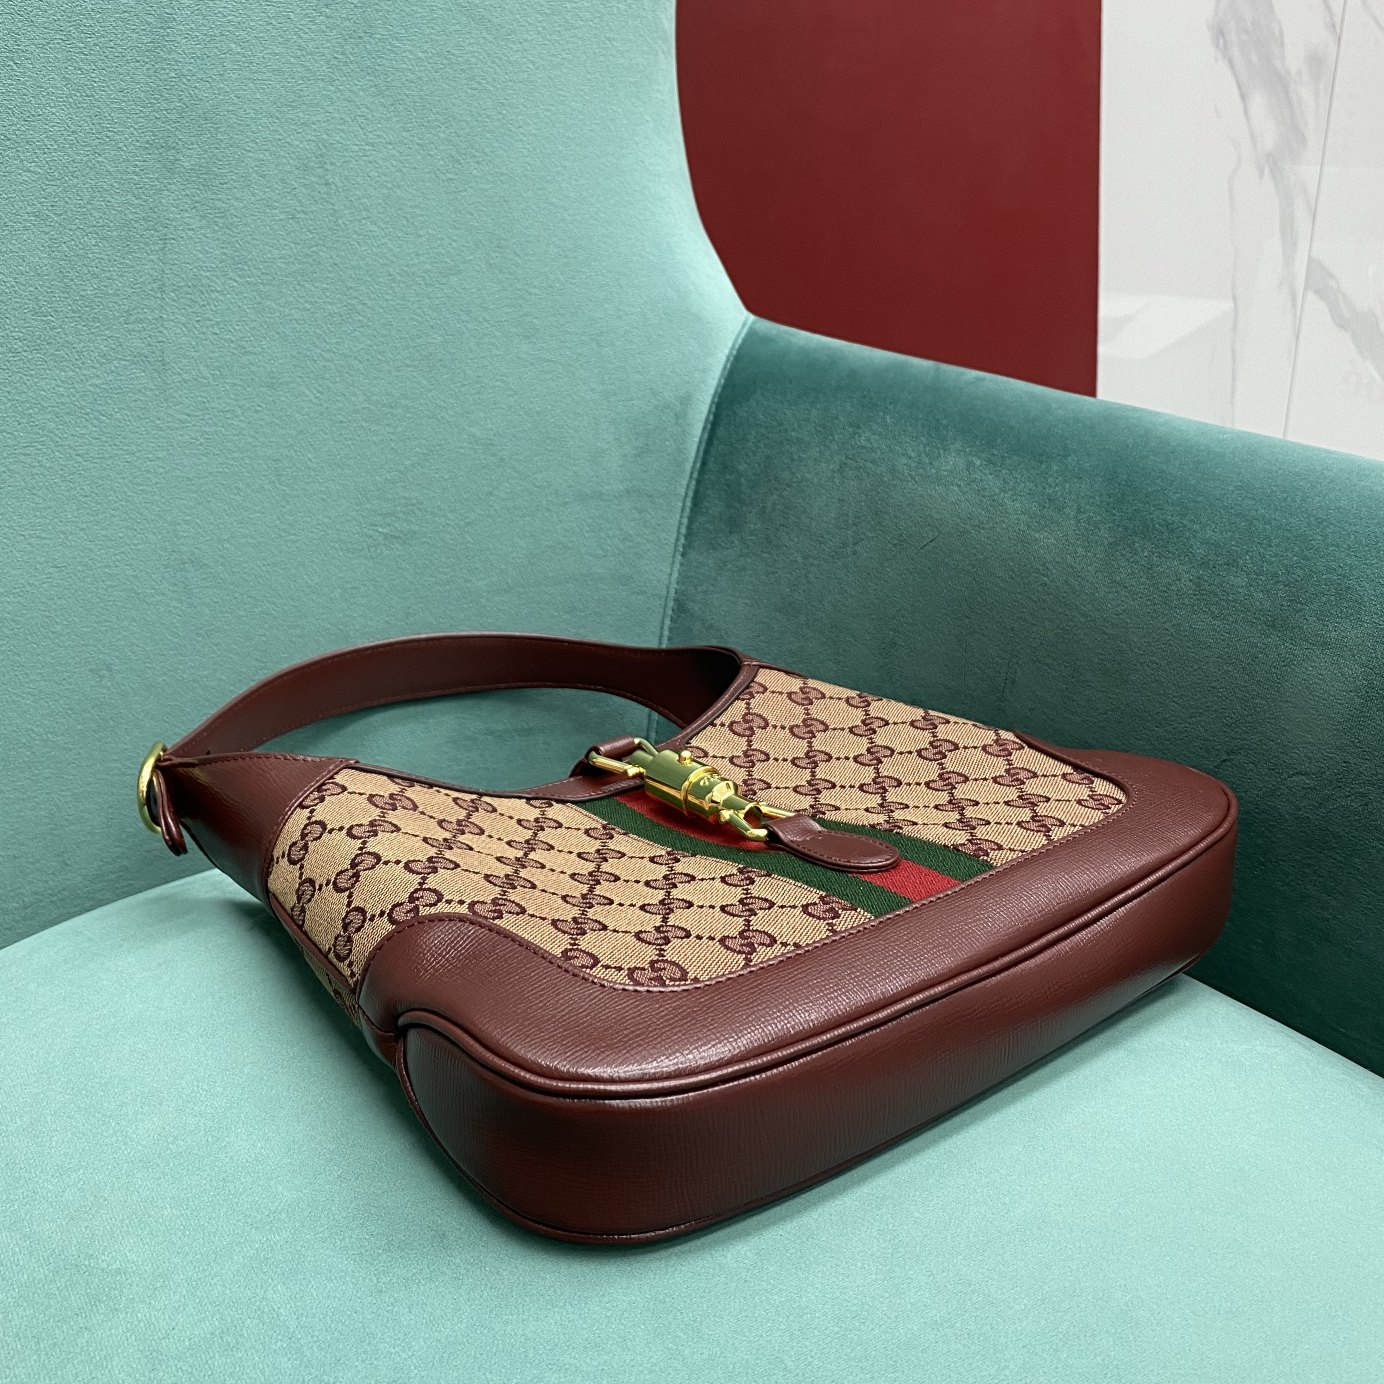 【P1250】Gucci jackie 1961系列 古奇636706酒红帆布单肩斜挎女包28CM